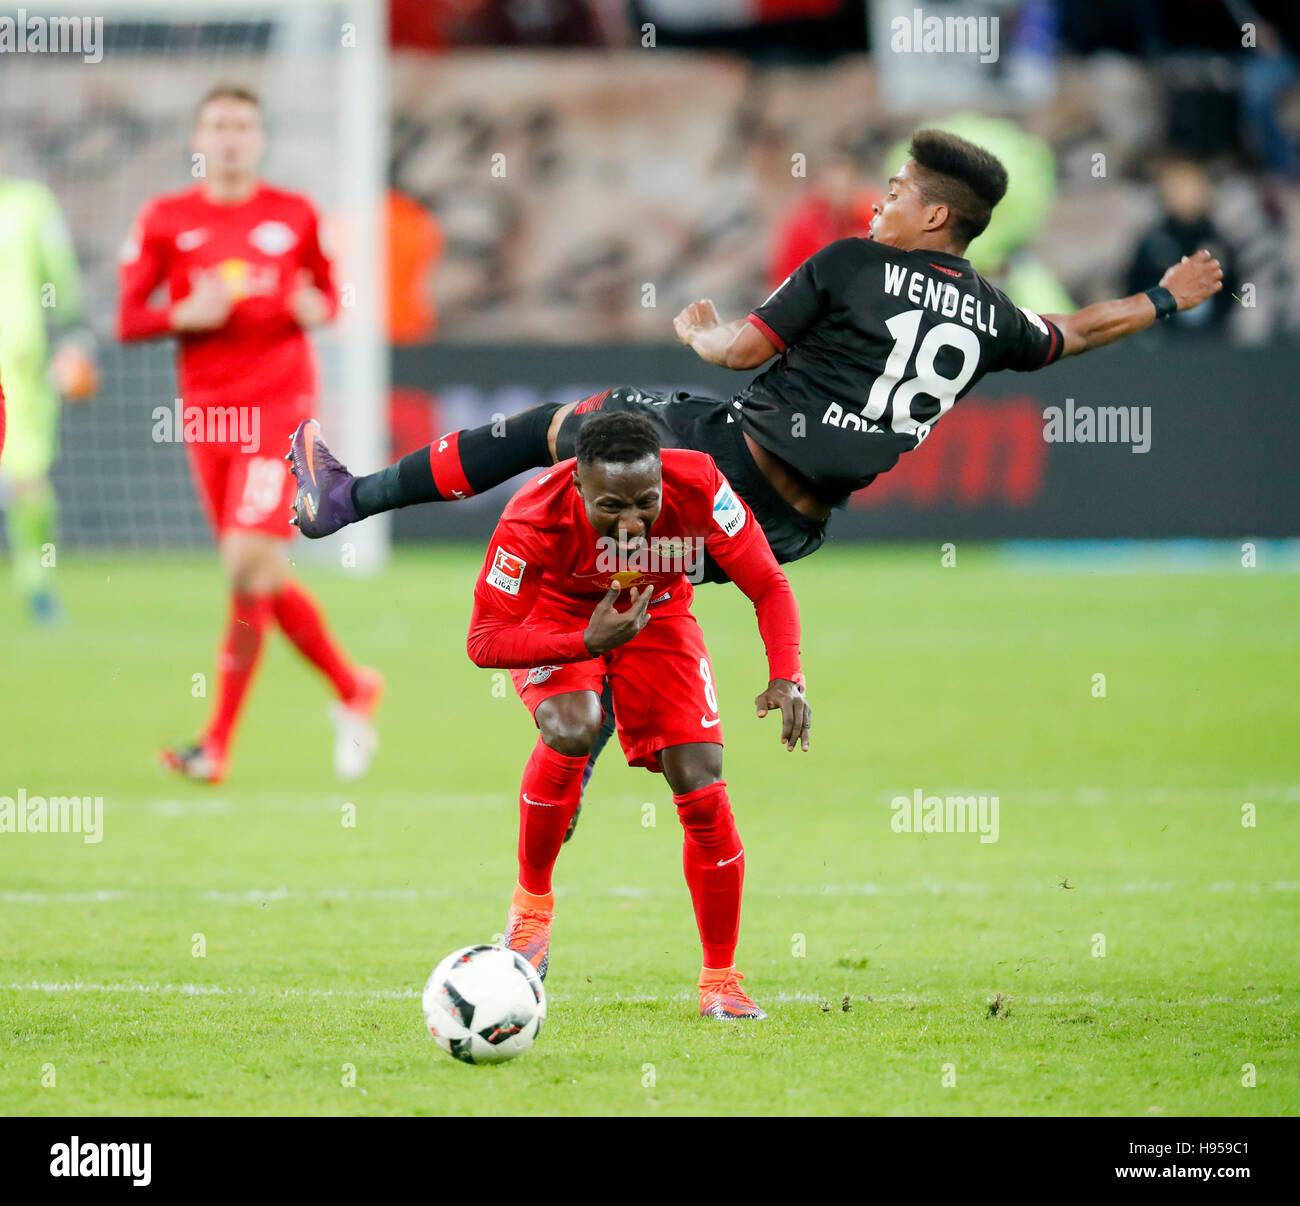 Leverkusen, Germany. 18th Nov, 2016. Naby KEITA, RB Leipzig 8 fights for the ball against WENDELL, Lev 18 BAYER - Stock Image